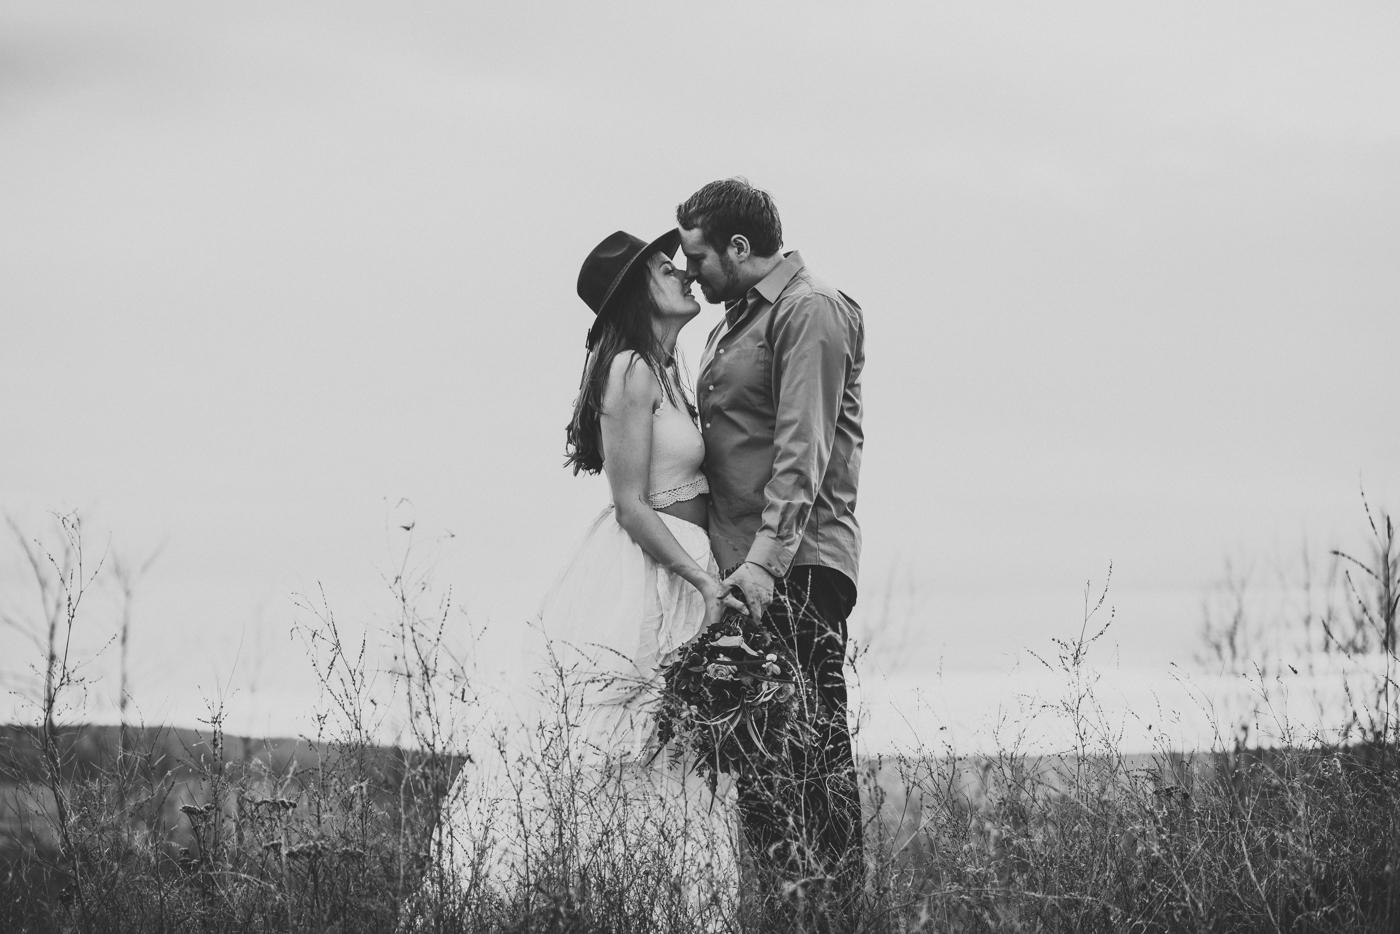 FortSt.John_photographer_TyraEPhotography_Wedding_Couple_Family_Photograhy_DawsonCreek_Elopement_Bride_Boduoir_Portraits-41.jpg